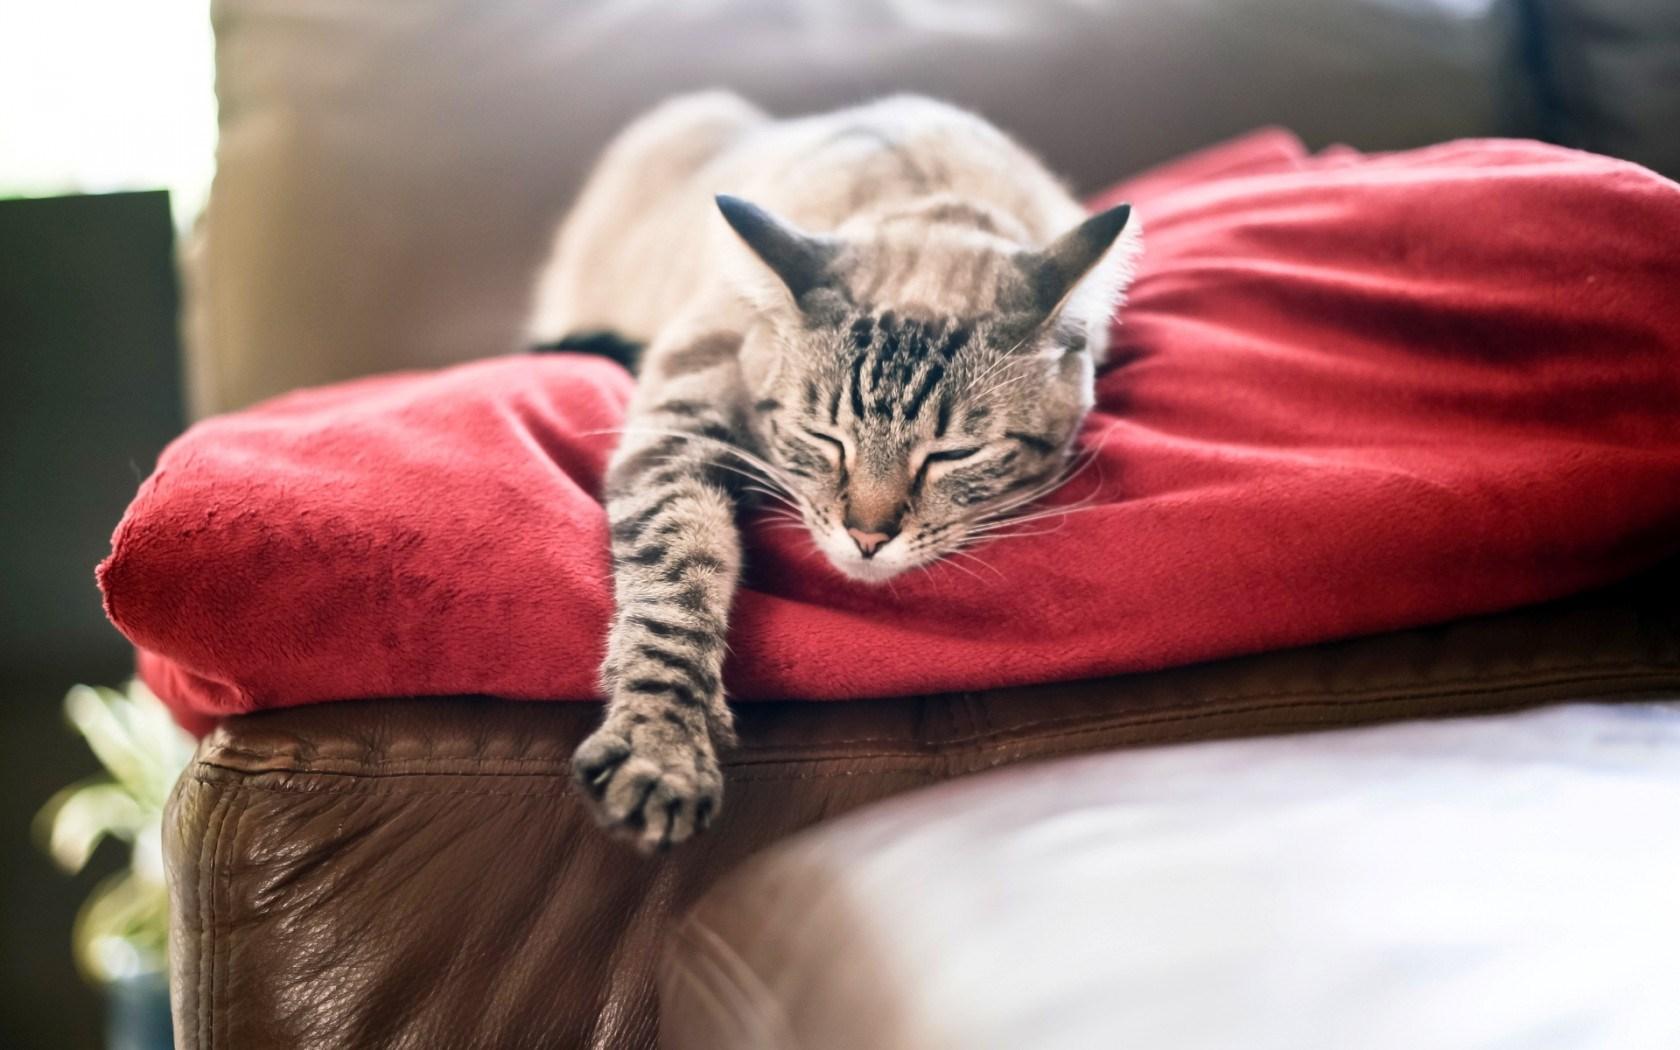 3d Cat Wallpapers Download Cat Sleeping Tired Hd Desktop Wallpapers 4k Hd